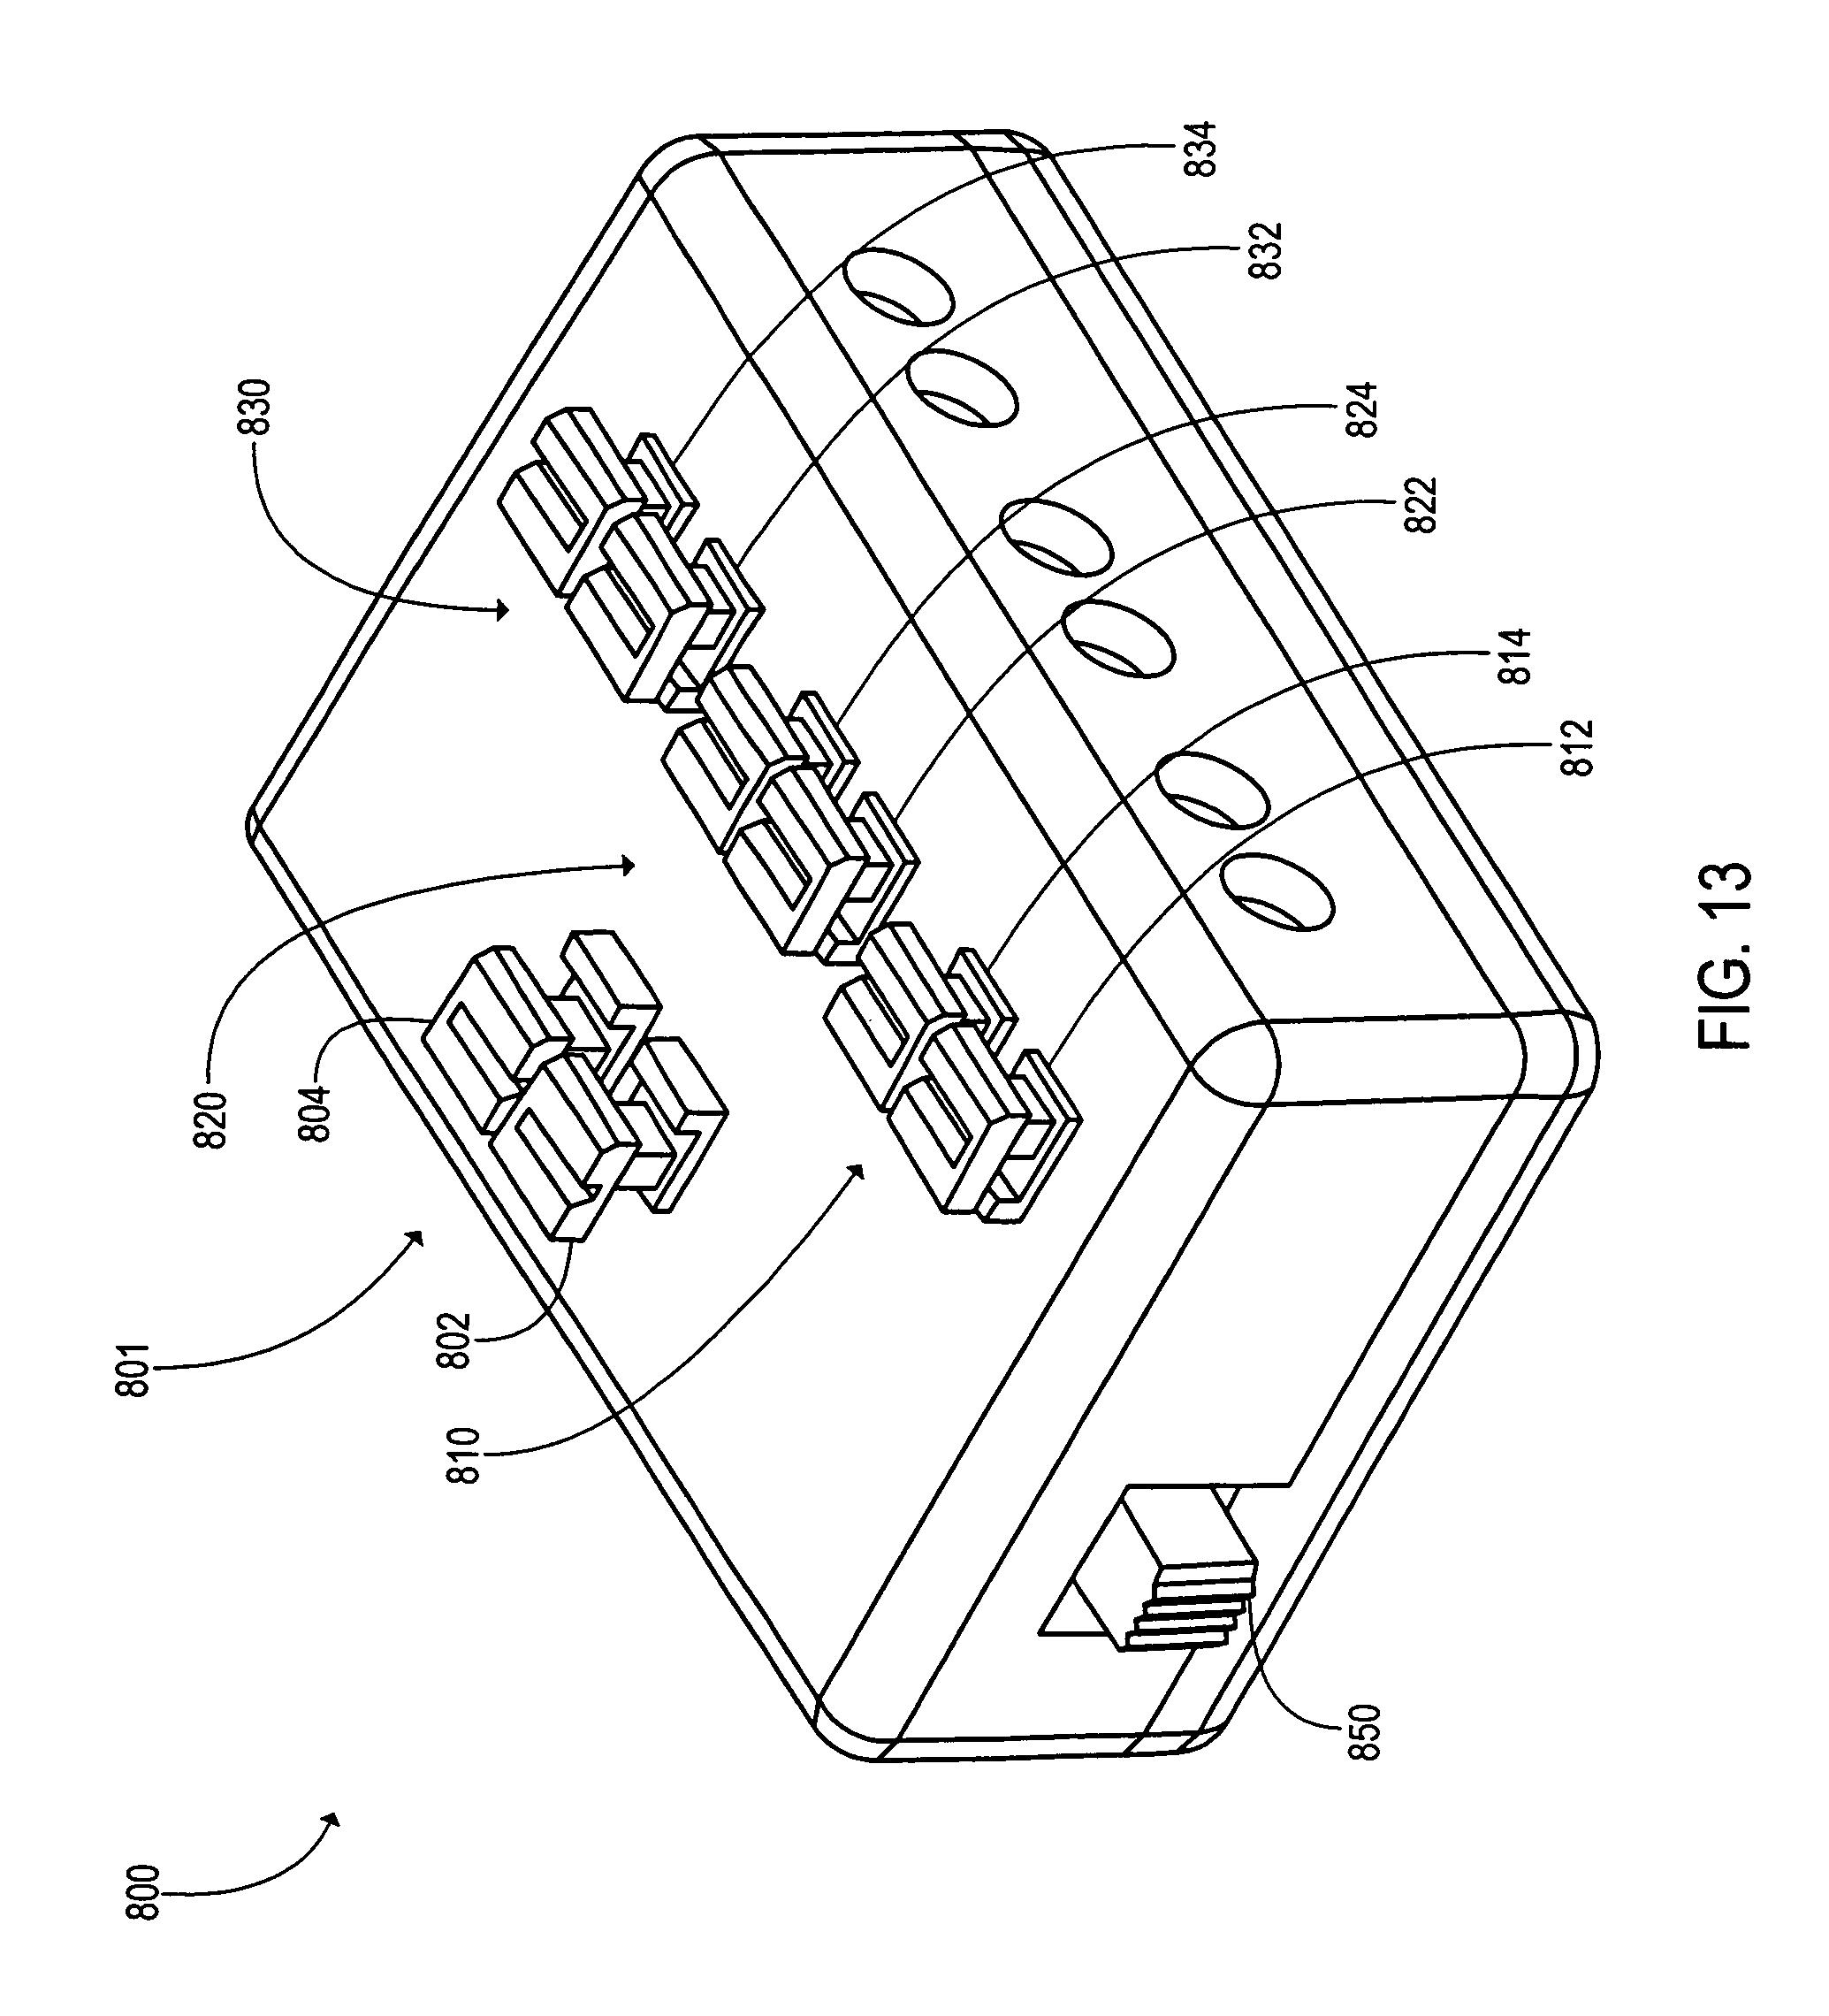 Baseboard heater wiring diagram the wiring diagram